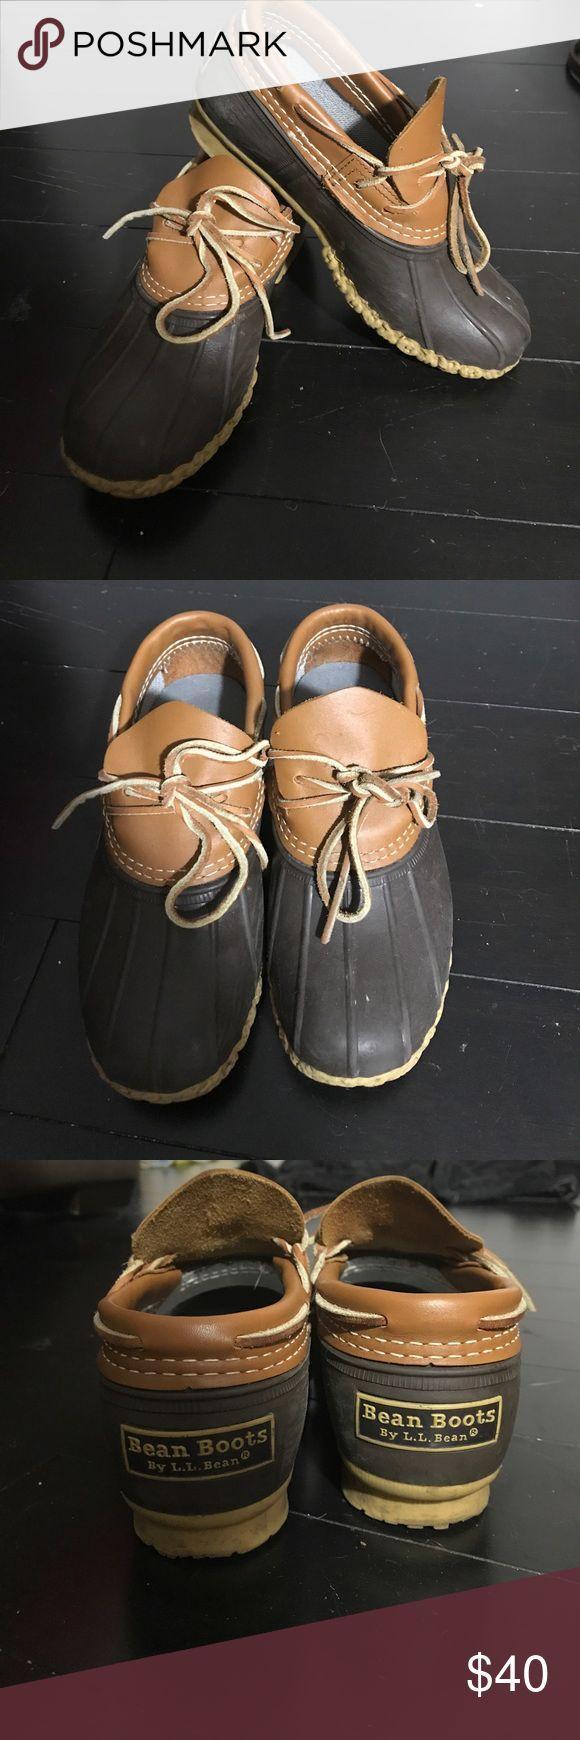 LL Bean rain booties LL Bean slip on rain booties, size 7.5 LL Bean Shoes Winter & Rain Boots